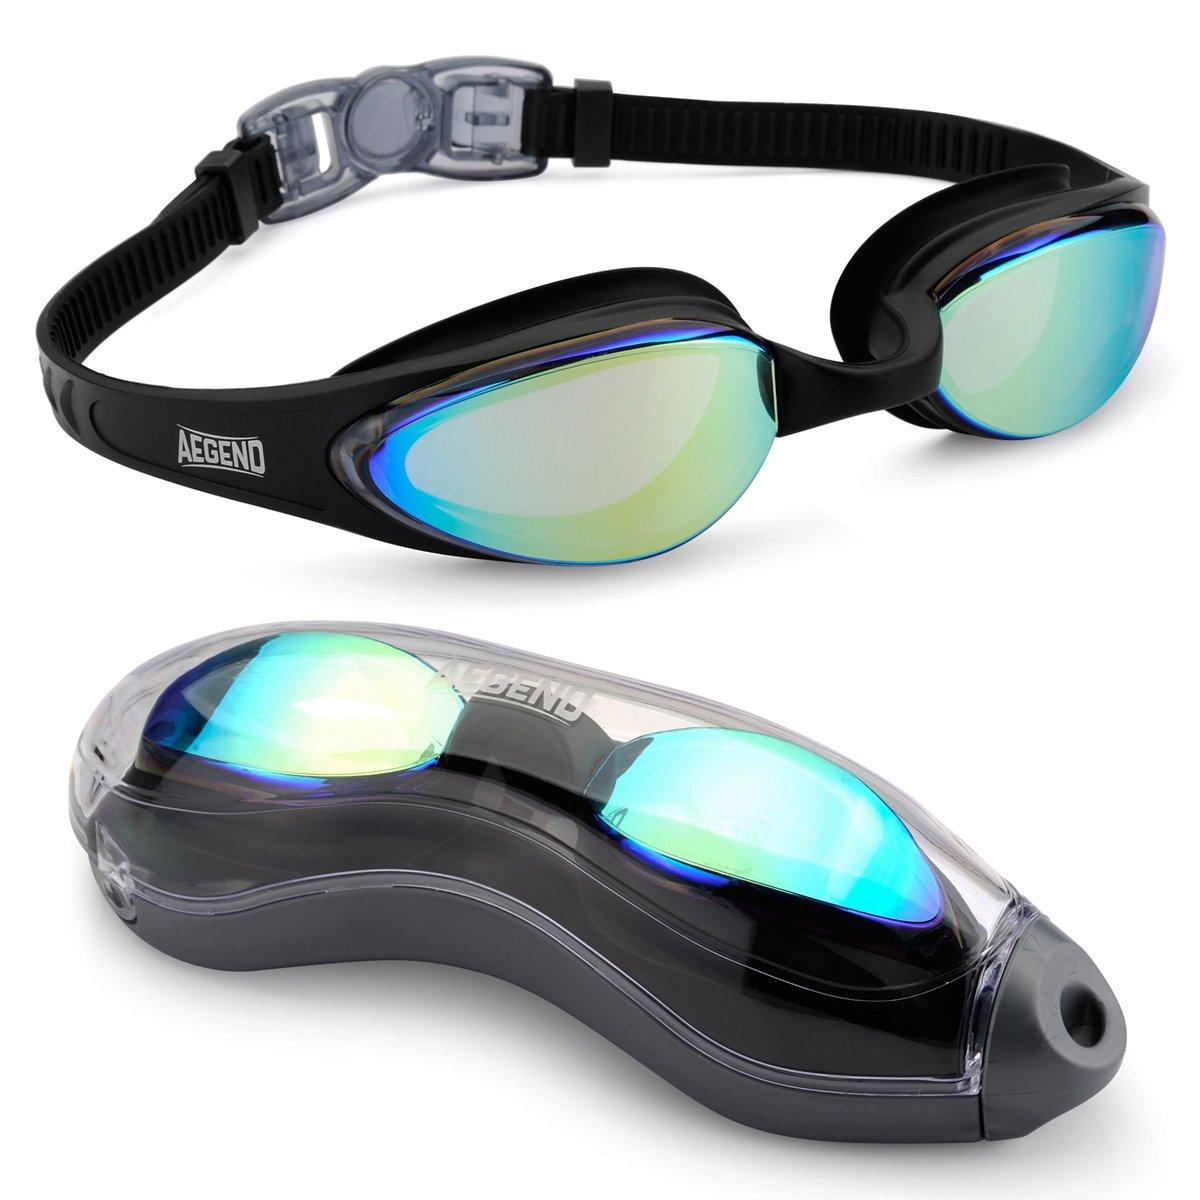 01f5eba069a0 Aegend S Swim Goggles Racing Swim Goggles Streamline Design - Soft Nose  Piece - Premium UV